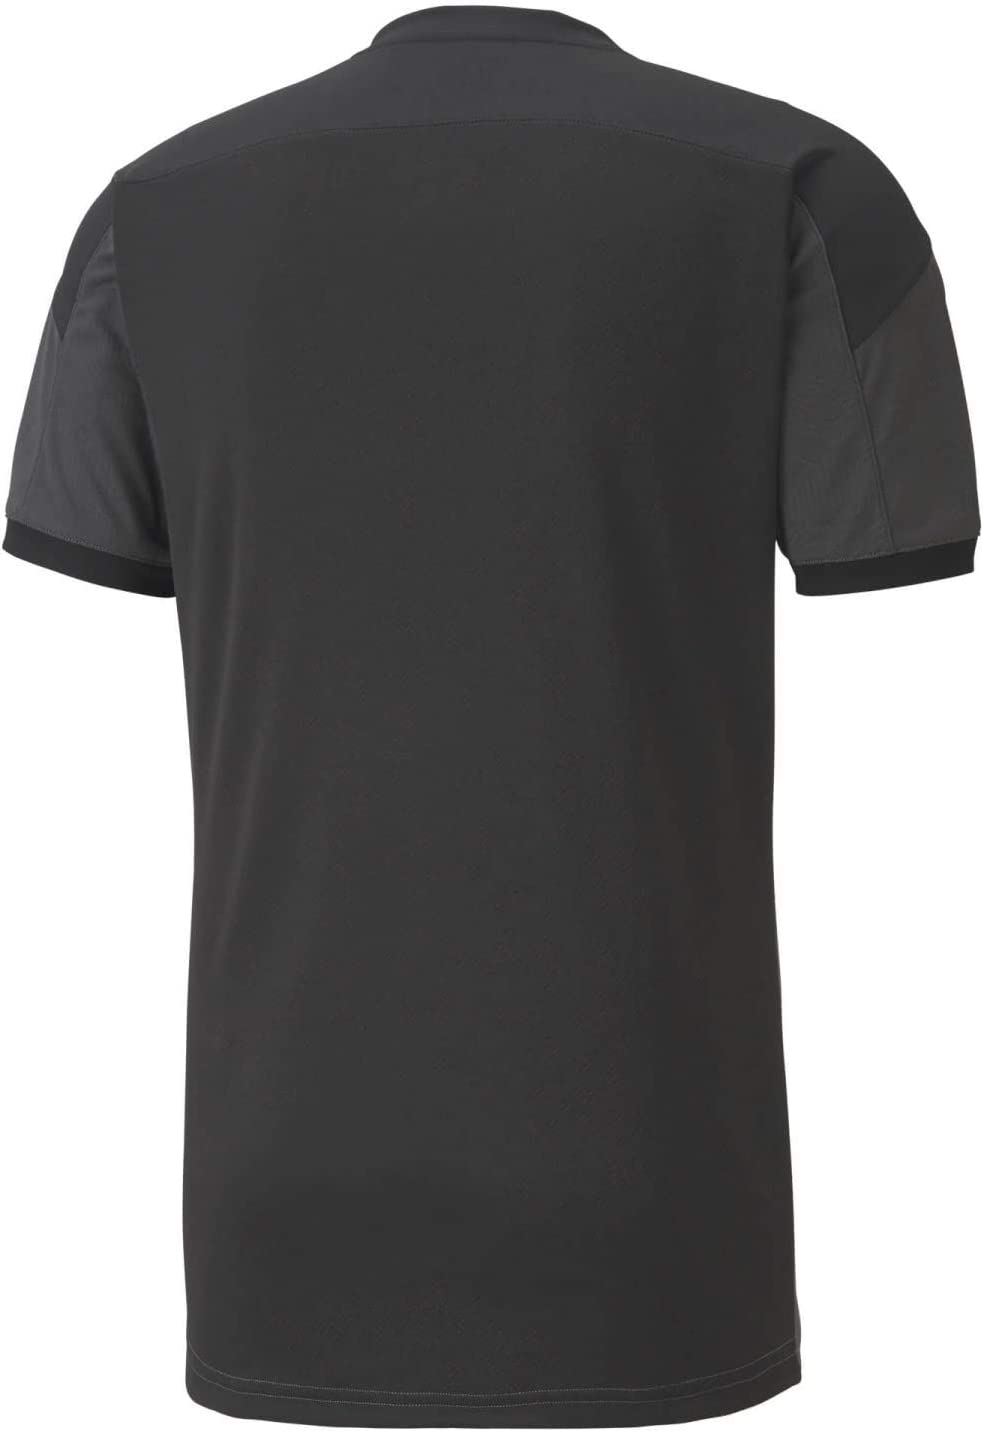 PUMA MCFC Training Jersey T-Shirt Uomo